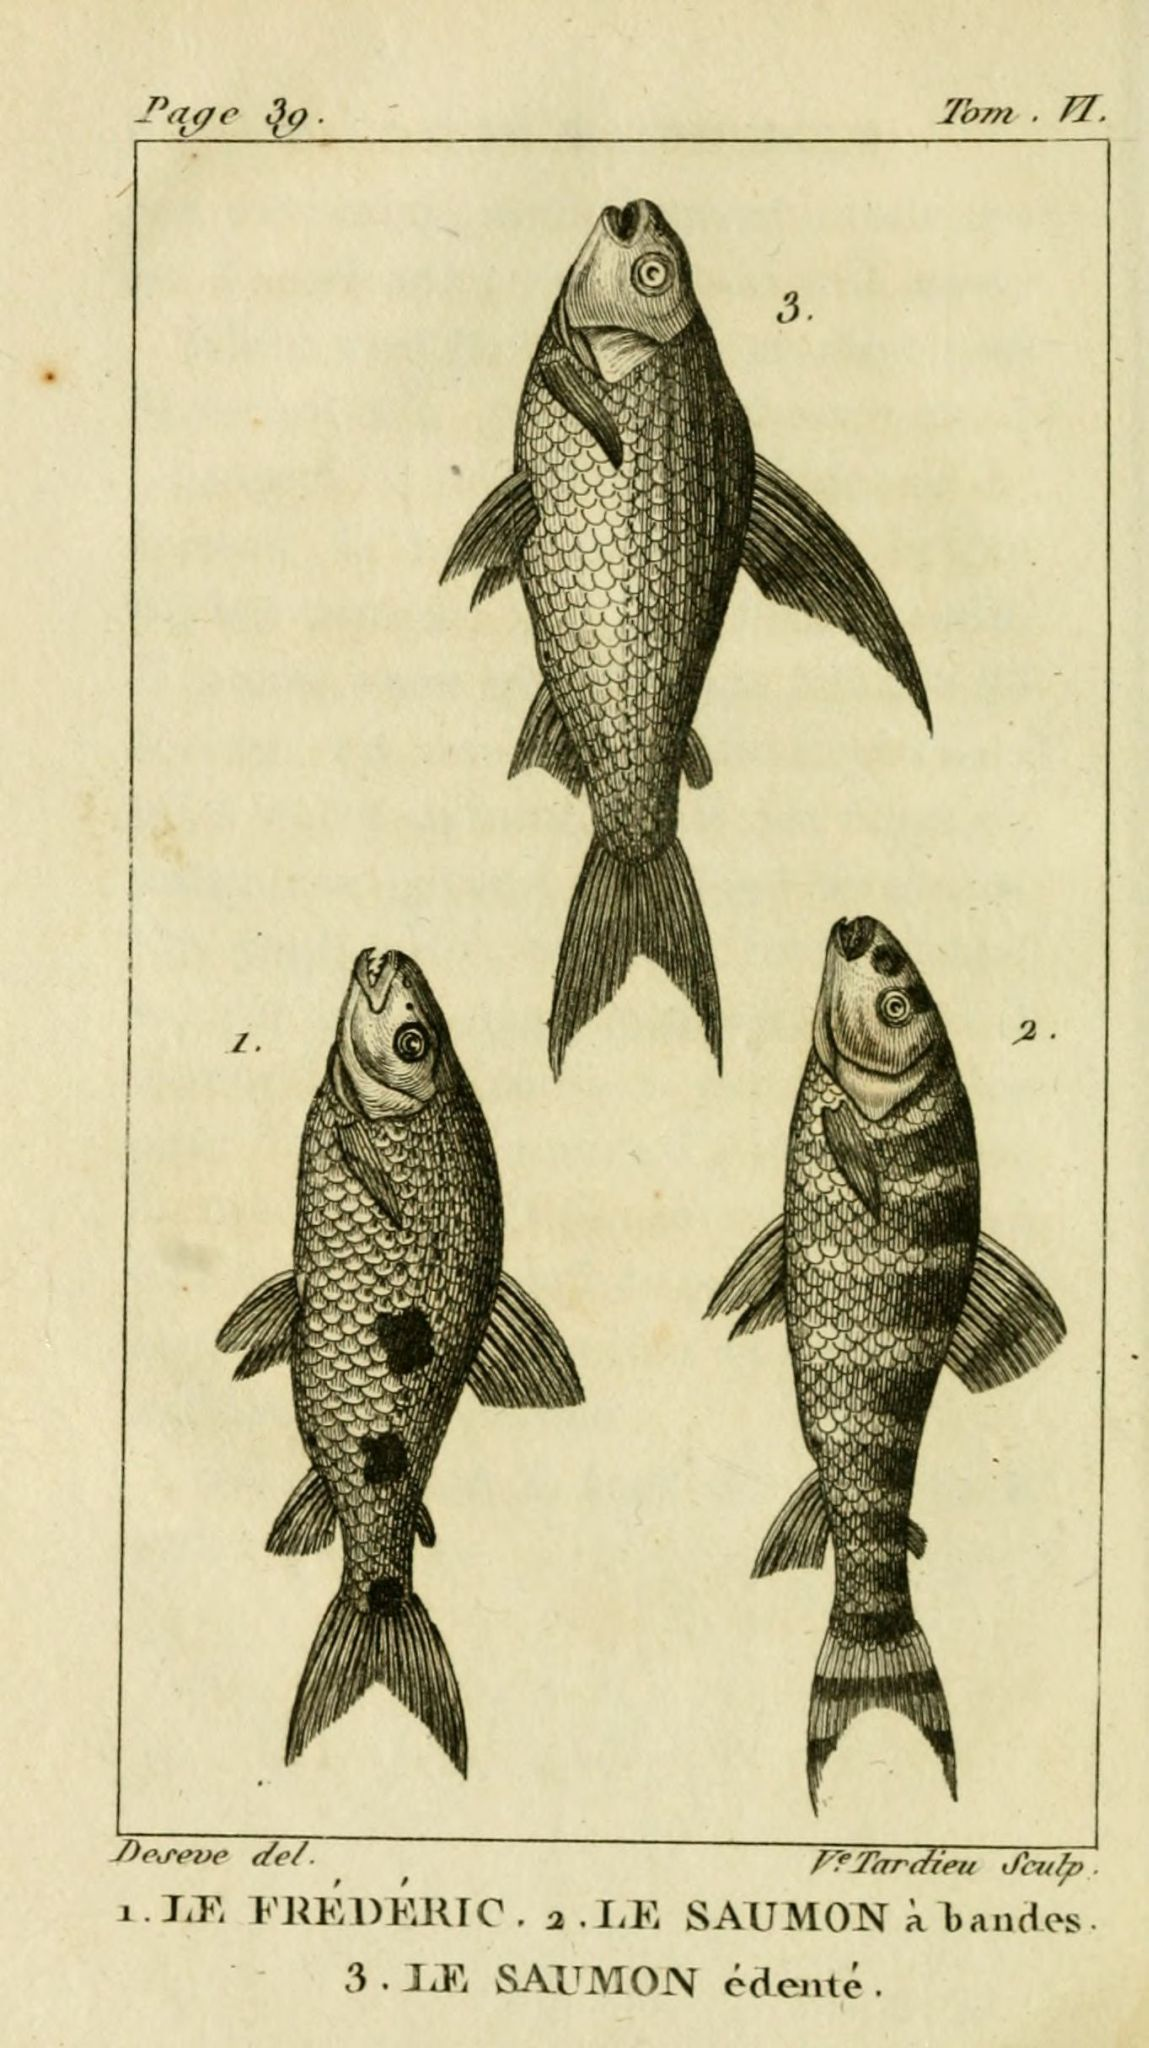 gravures_poissons_-_6054_frederic__-_saumon_a_bandes__-_saumon_edente